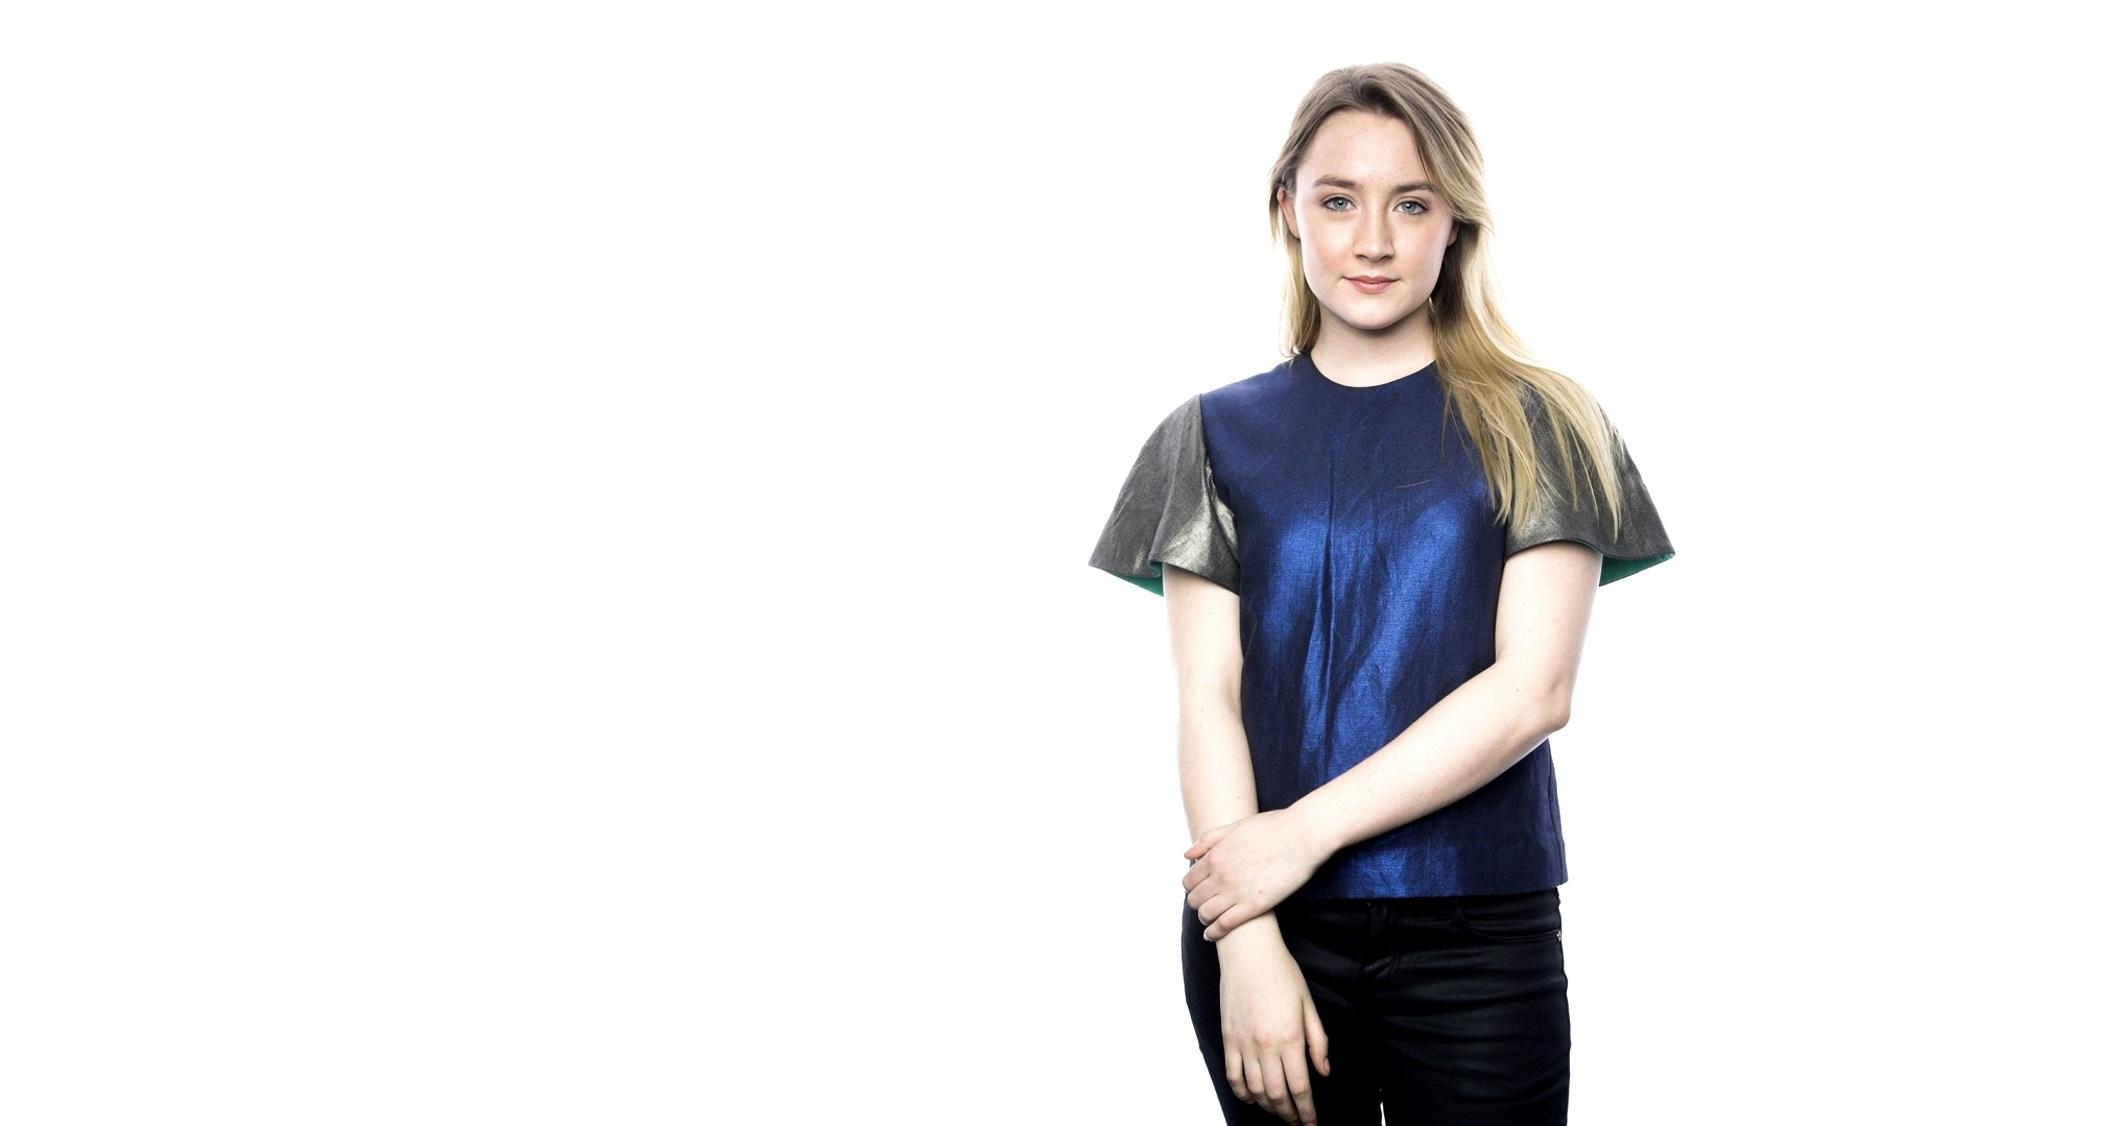 Saoirse Ronan High Quality Wallpapers